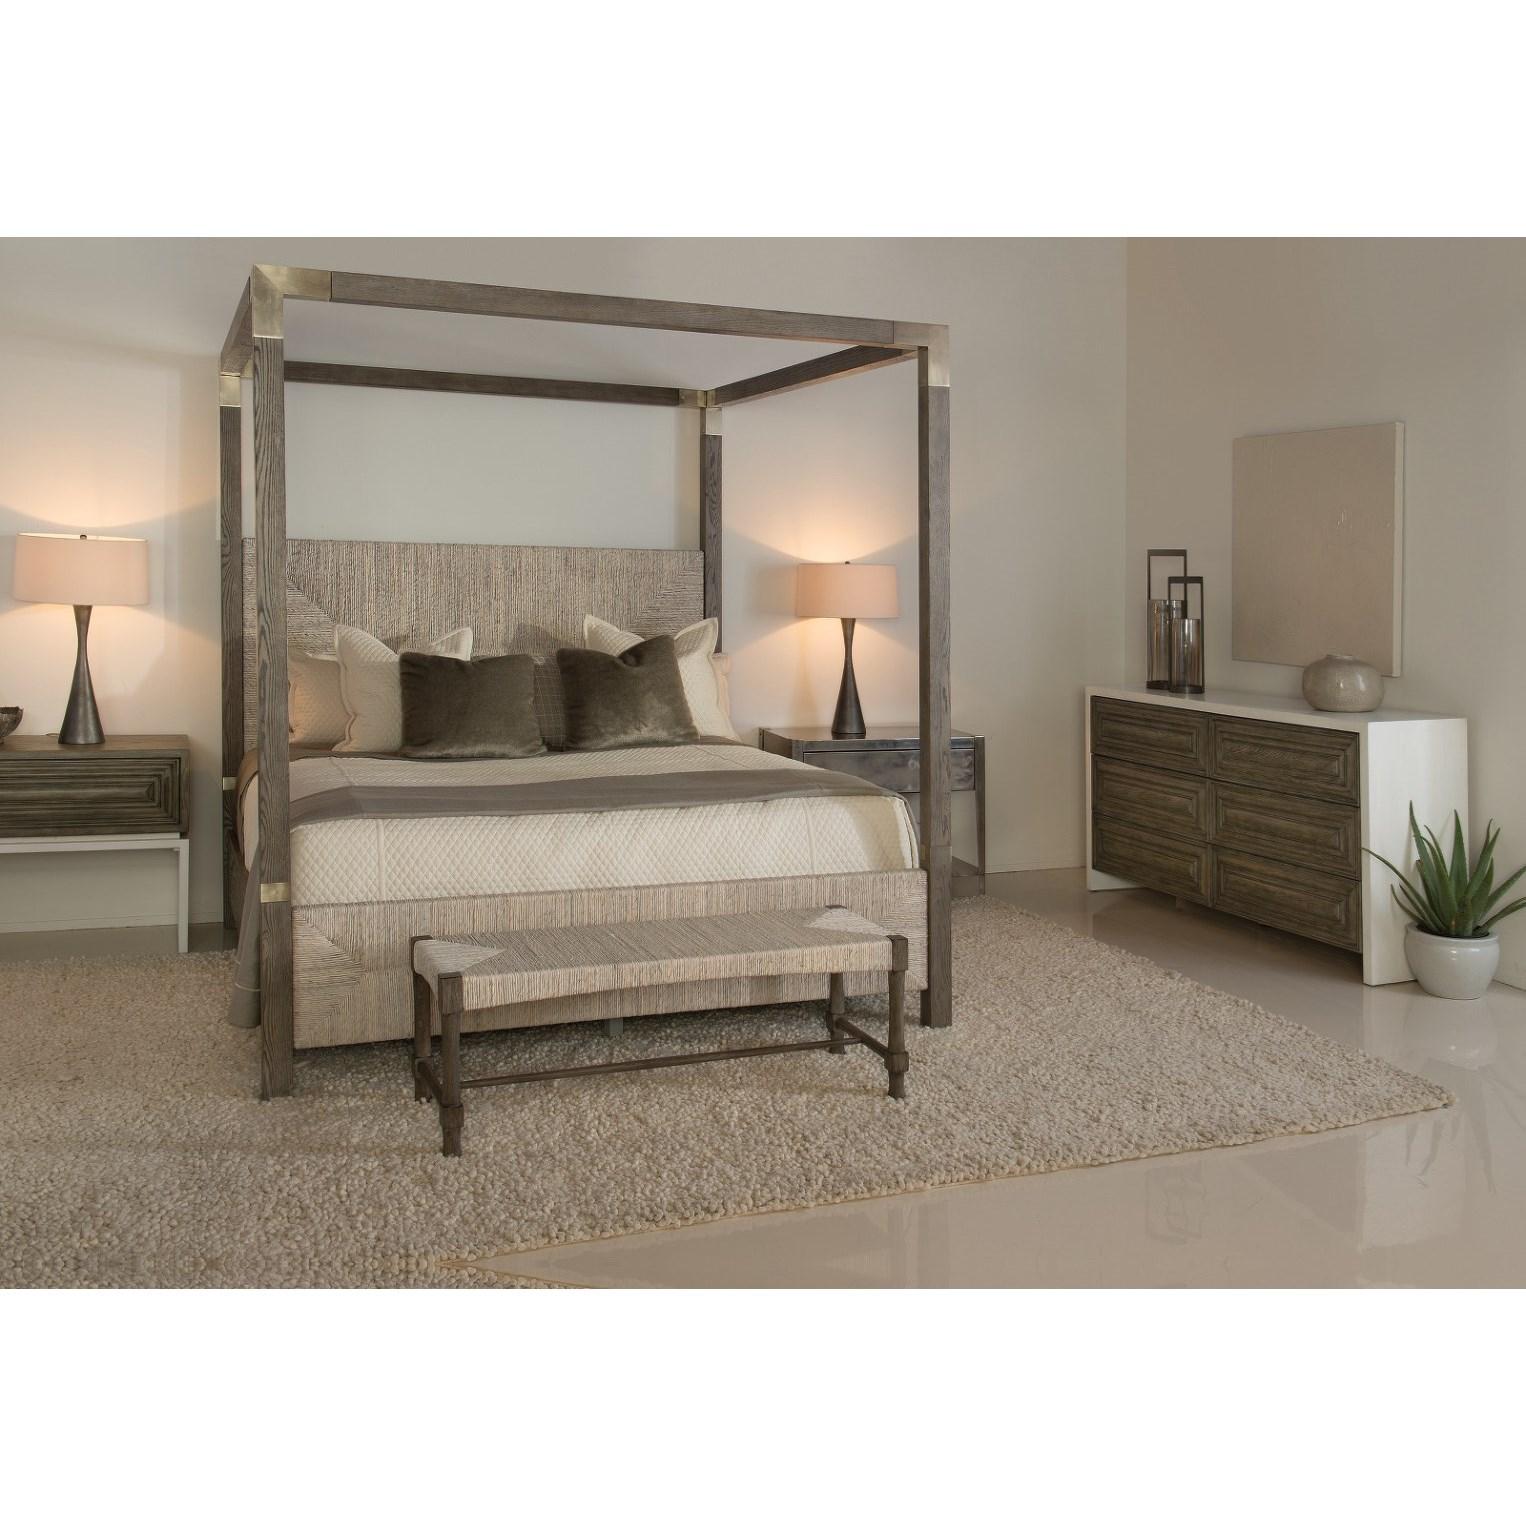 Bernhardt Palma California King Woven Abaca Canopy Bed